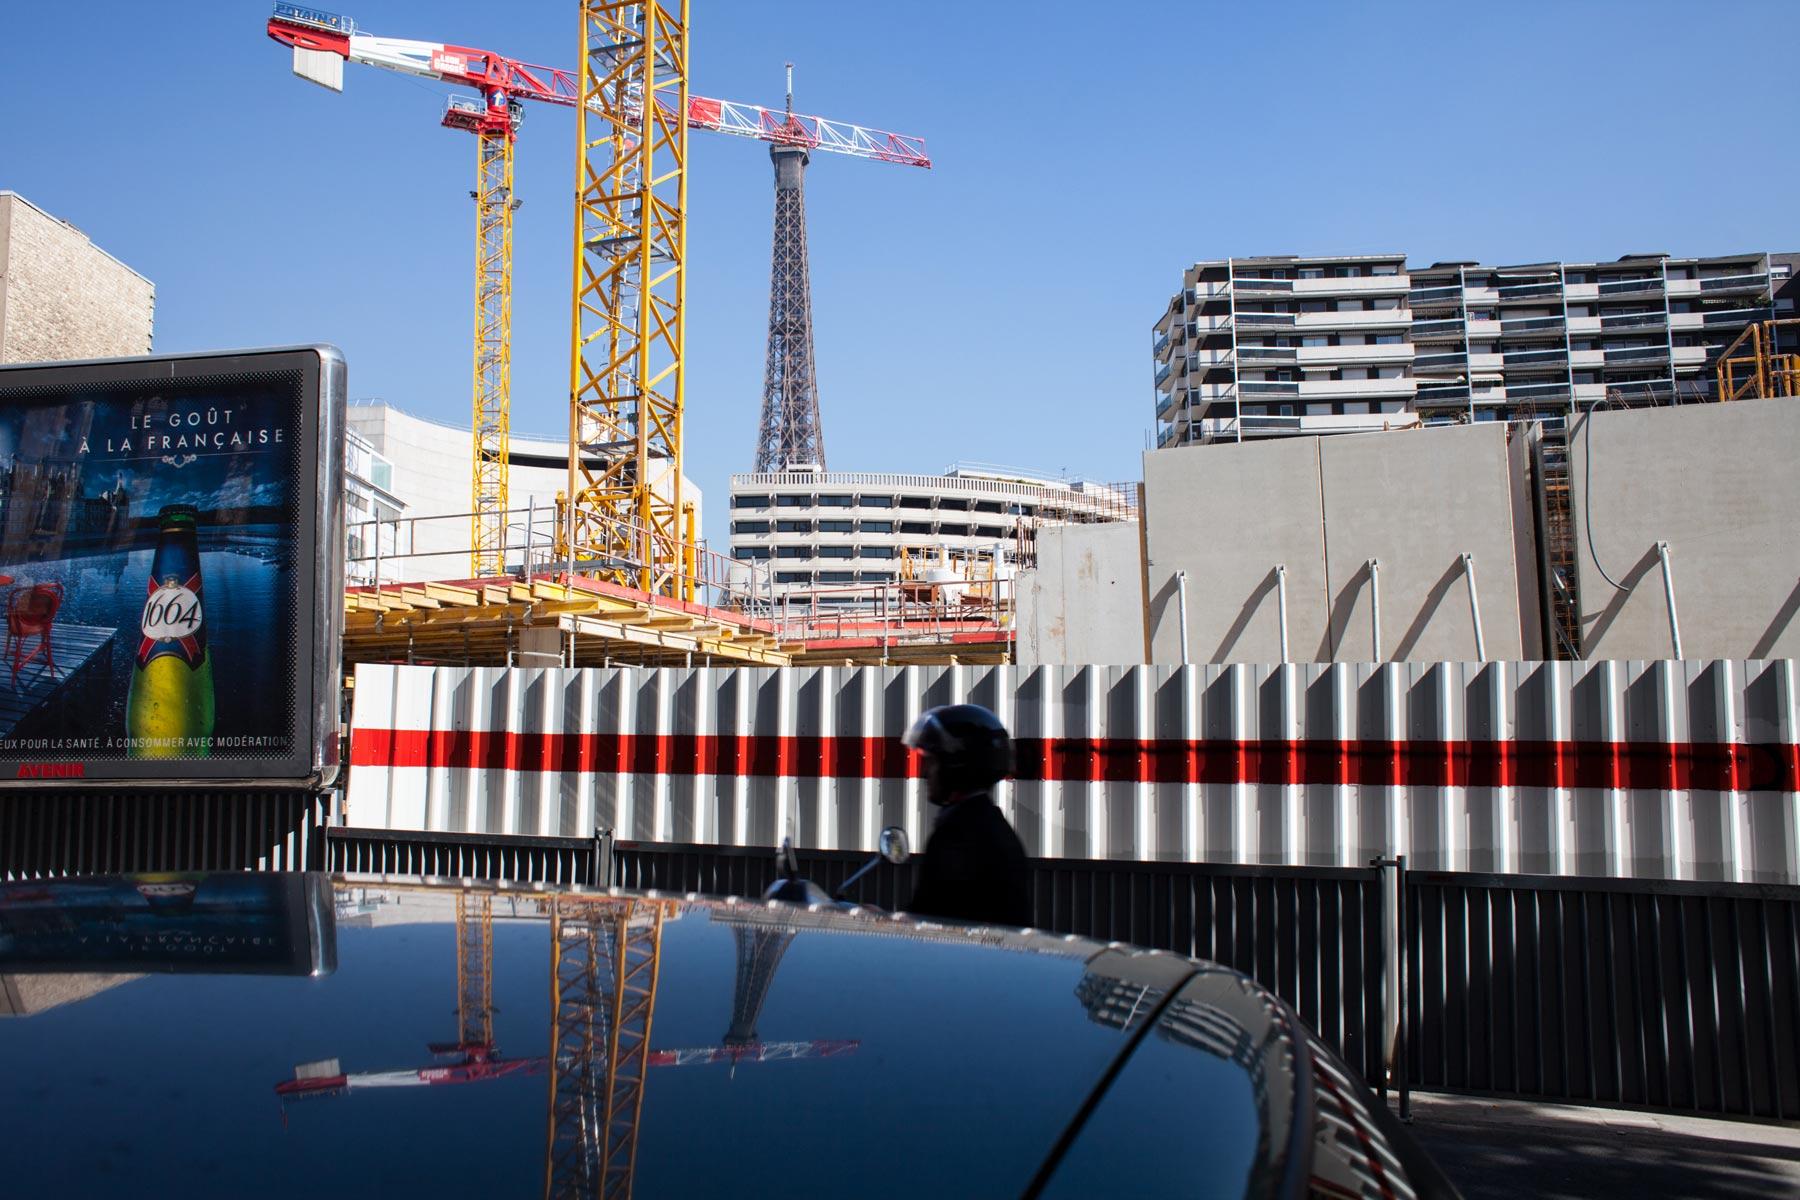 Paris-motorcyclist-construction-scene.jpg